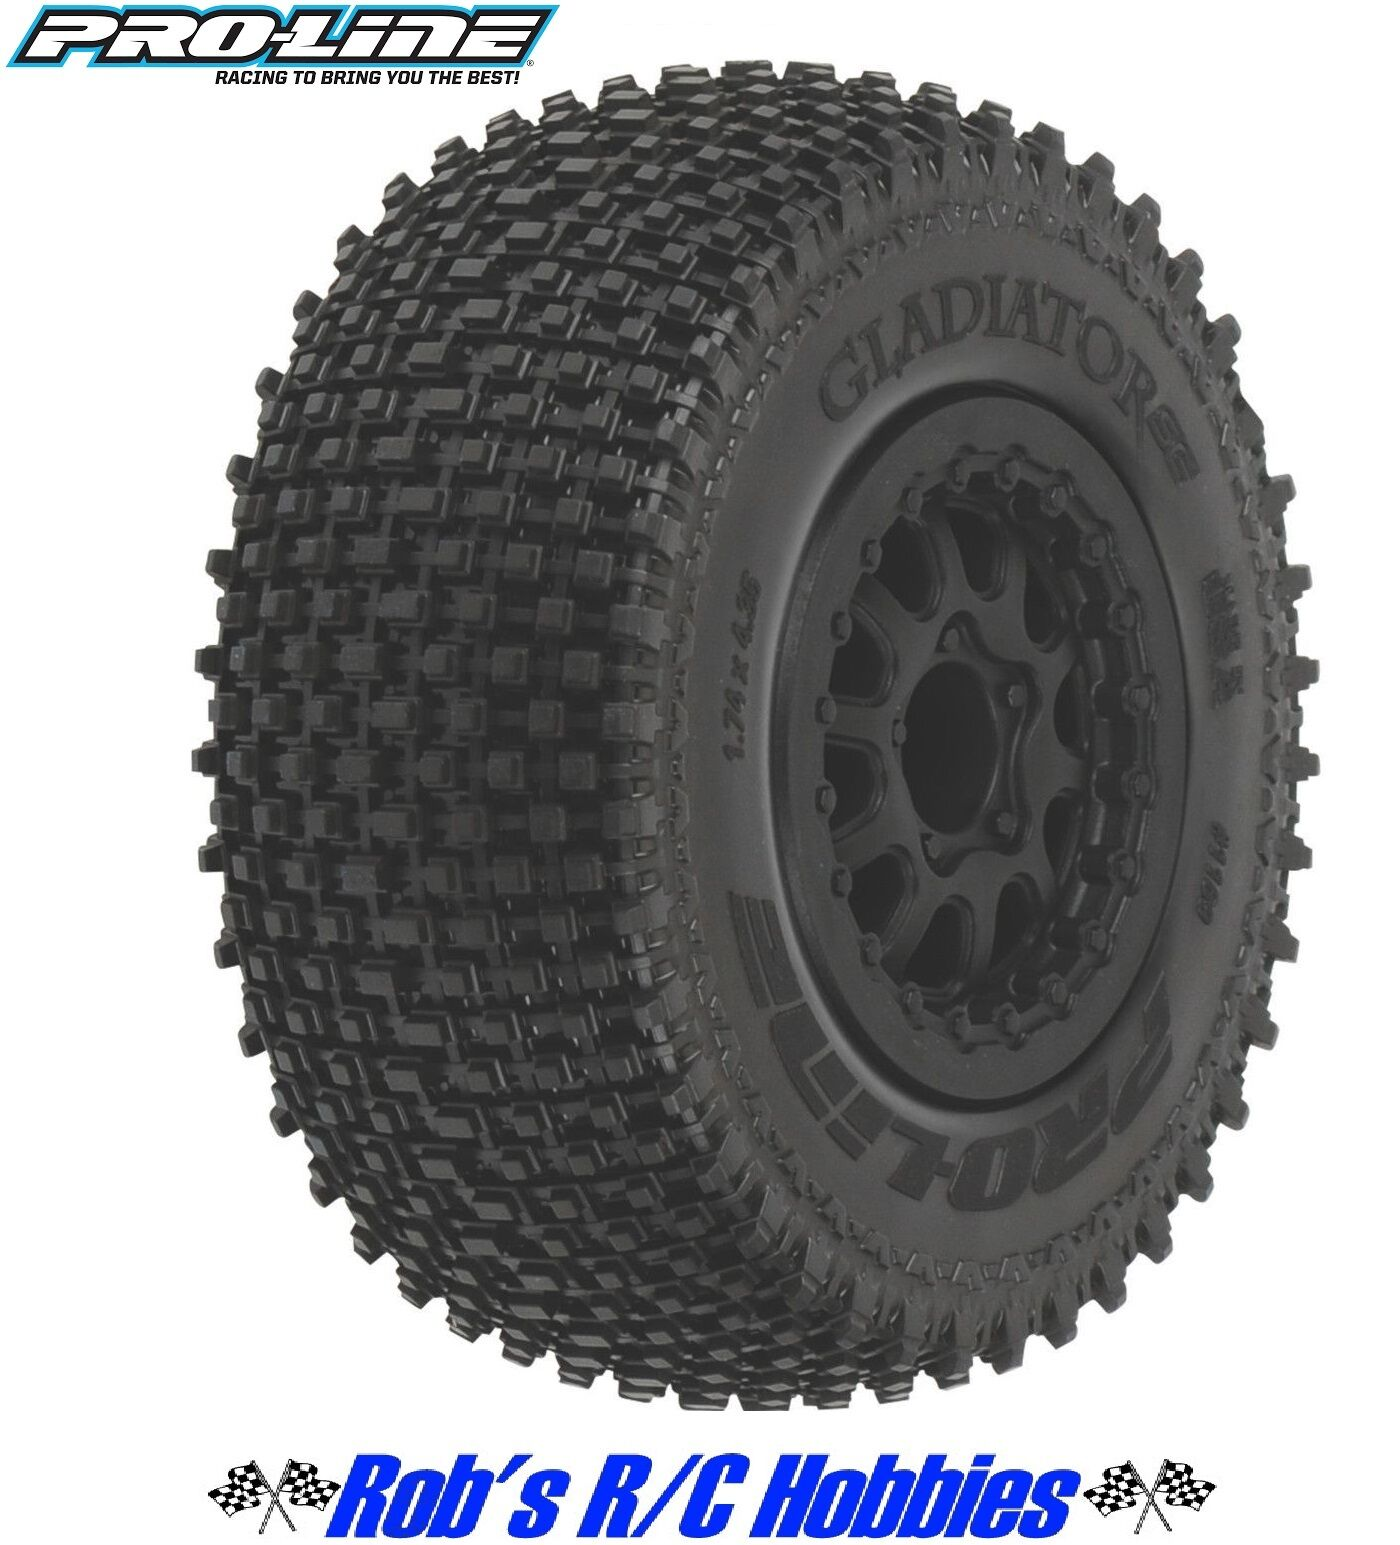 PROLINE Gladiator SC 2.2 3.0 M2 M2 M2 Mnt Renegade Whl Blk SLH (PRO116913) bbc271